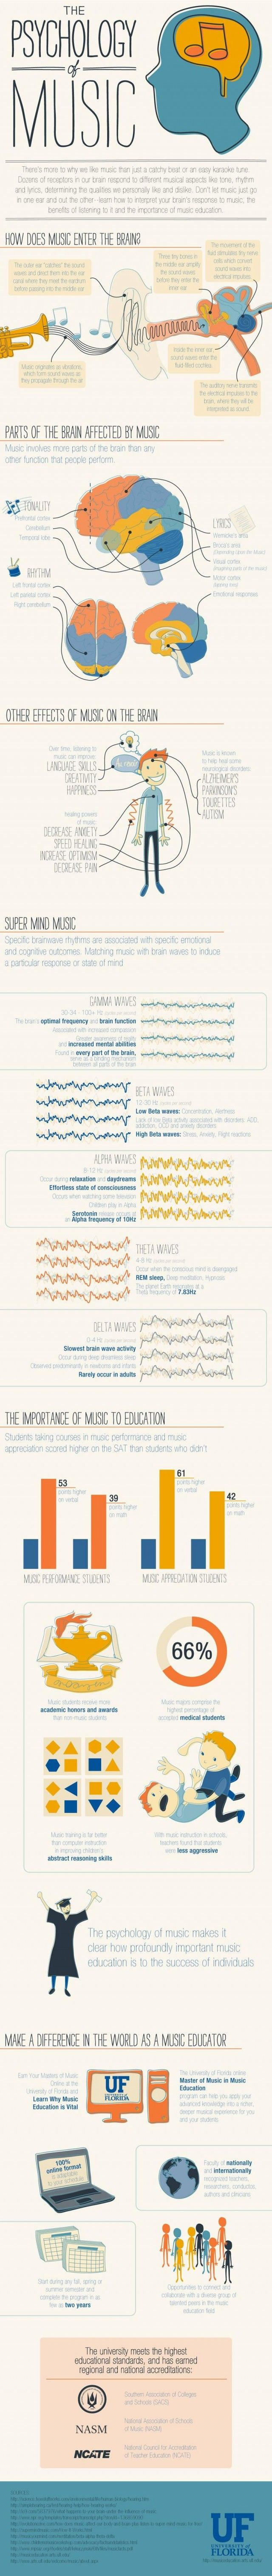 music think